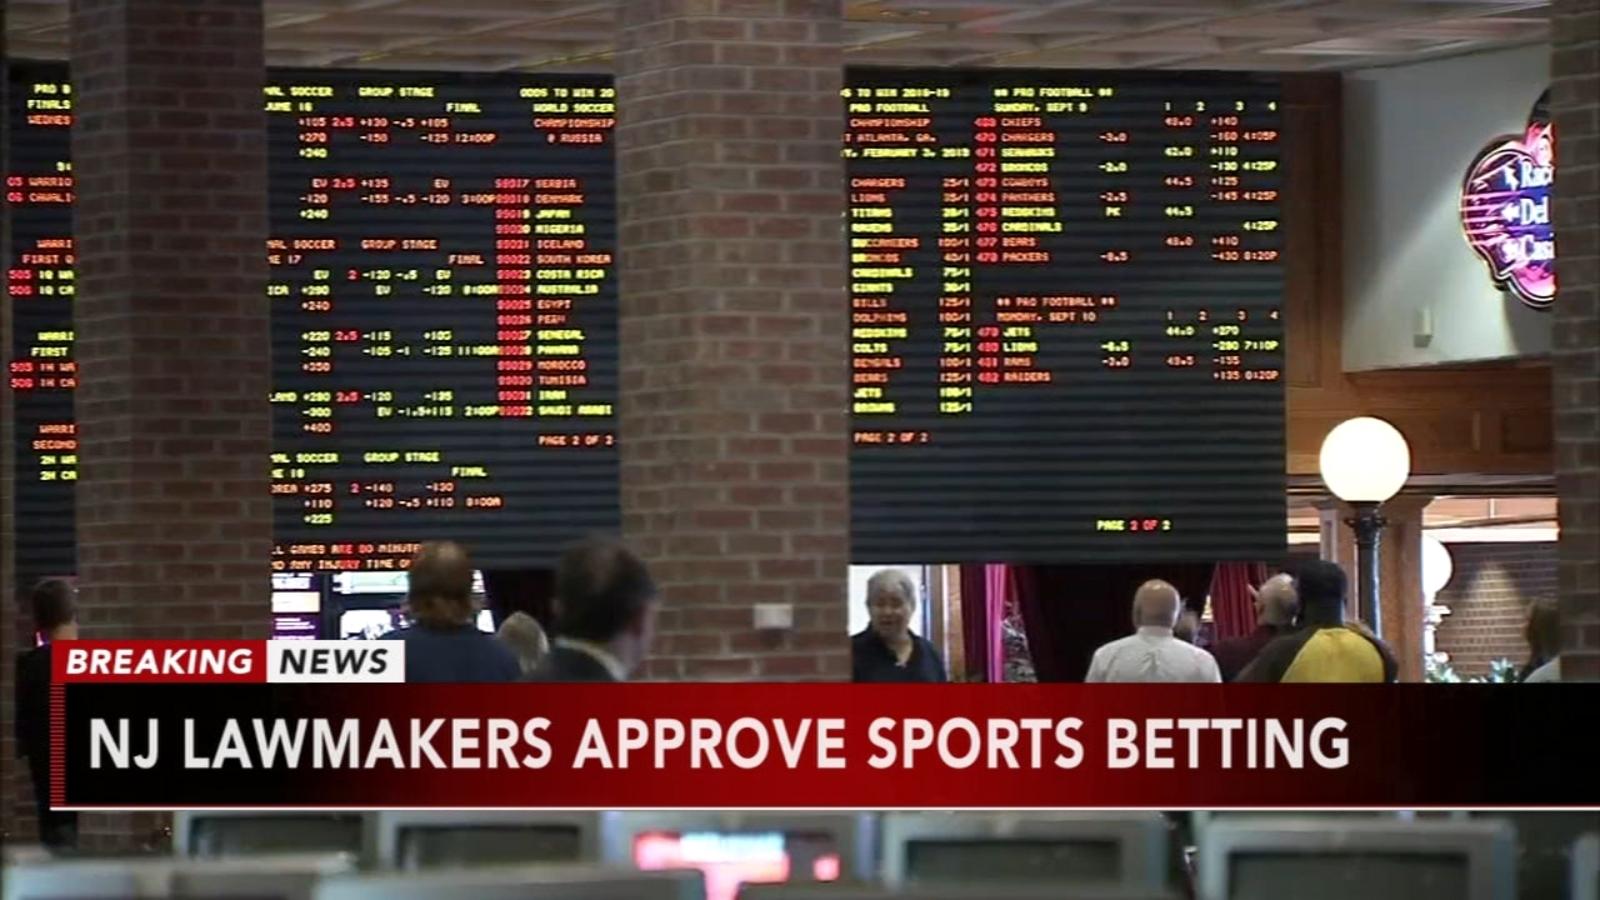 Nj sports betting legislation passed mk dons v swindon betting calculator